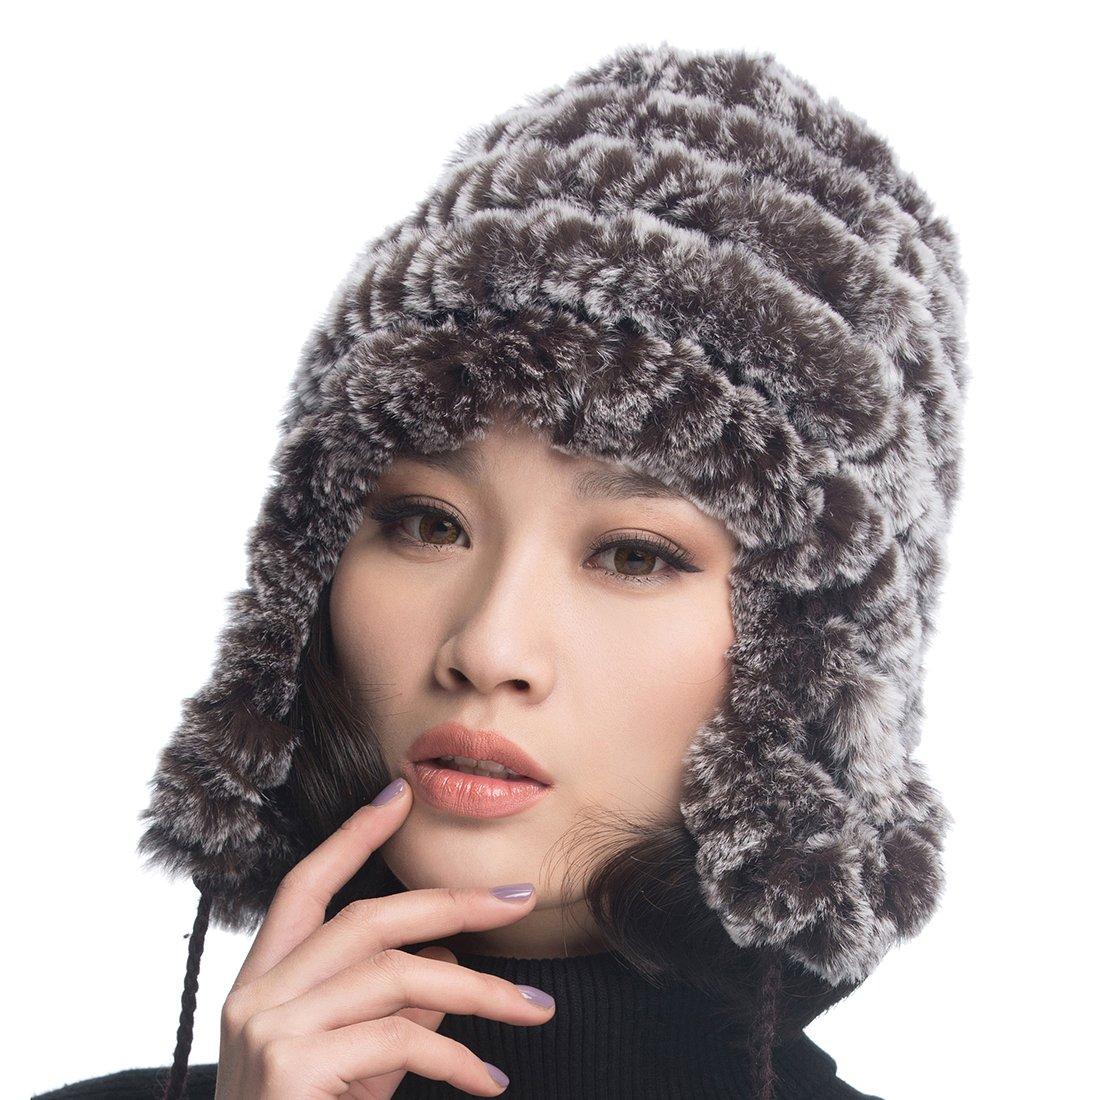 URSFUR Women's Rex Rabbit Fur Hats Winter Ear Cap Flexible Multicolor (Coffee Color) by URSFUR